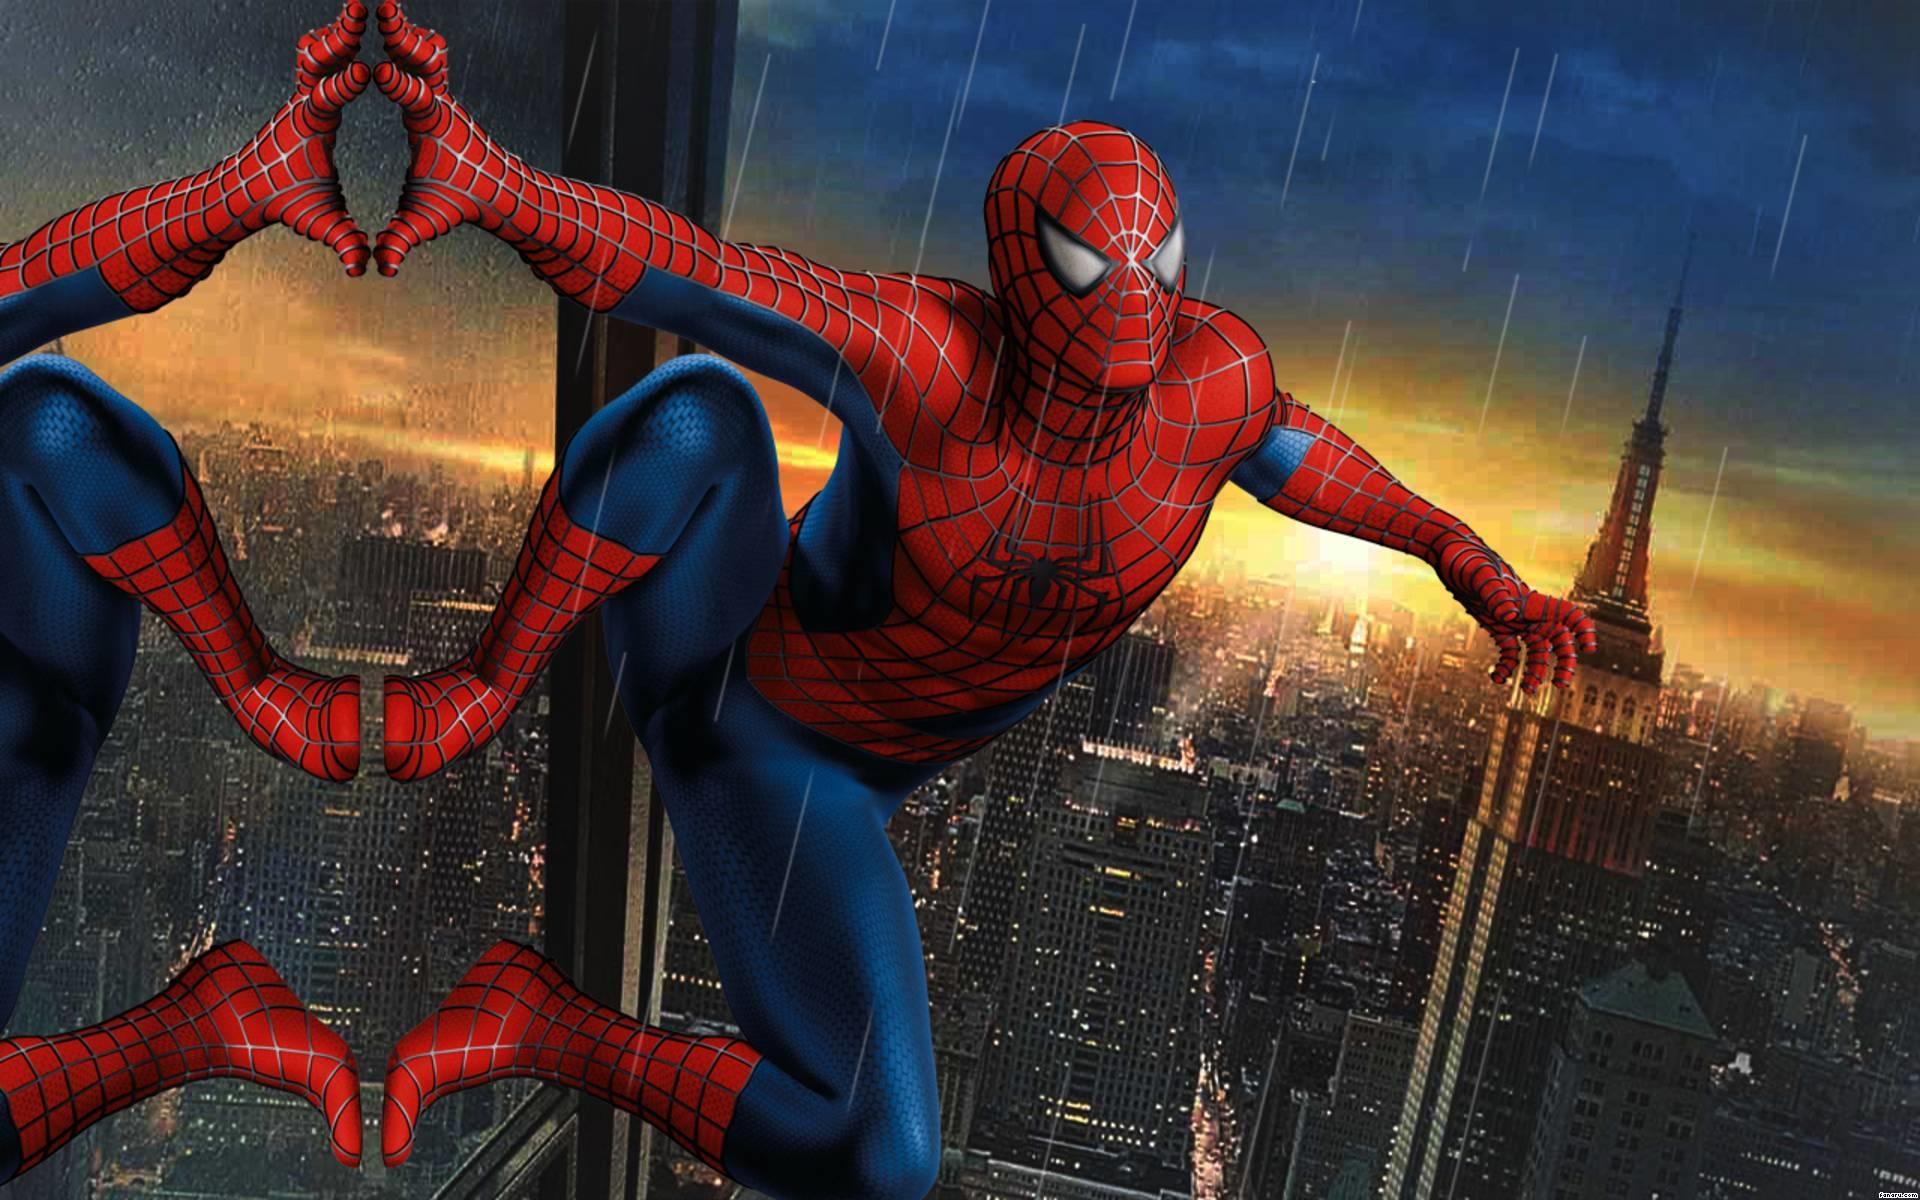 spider man climbing building comic wallpaper